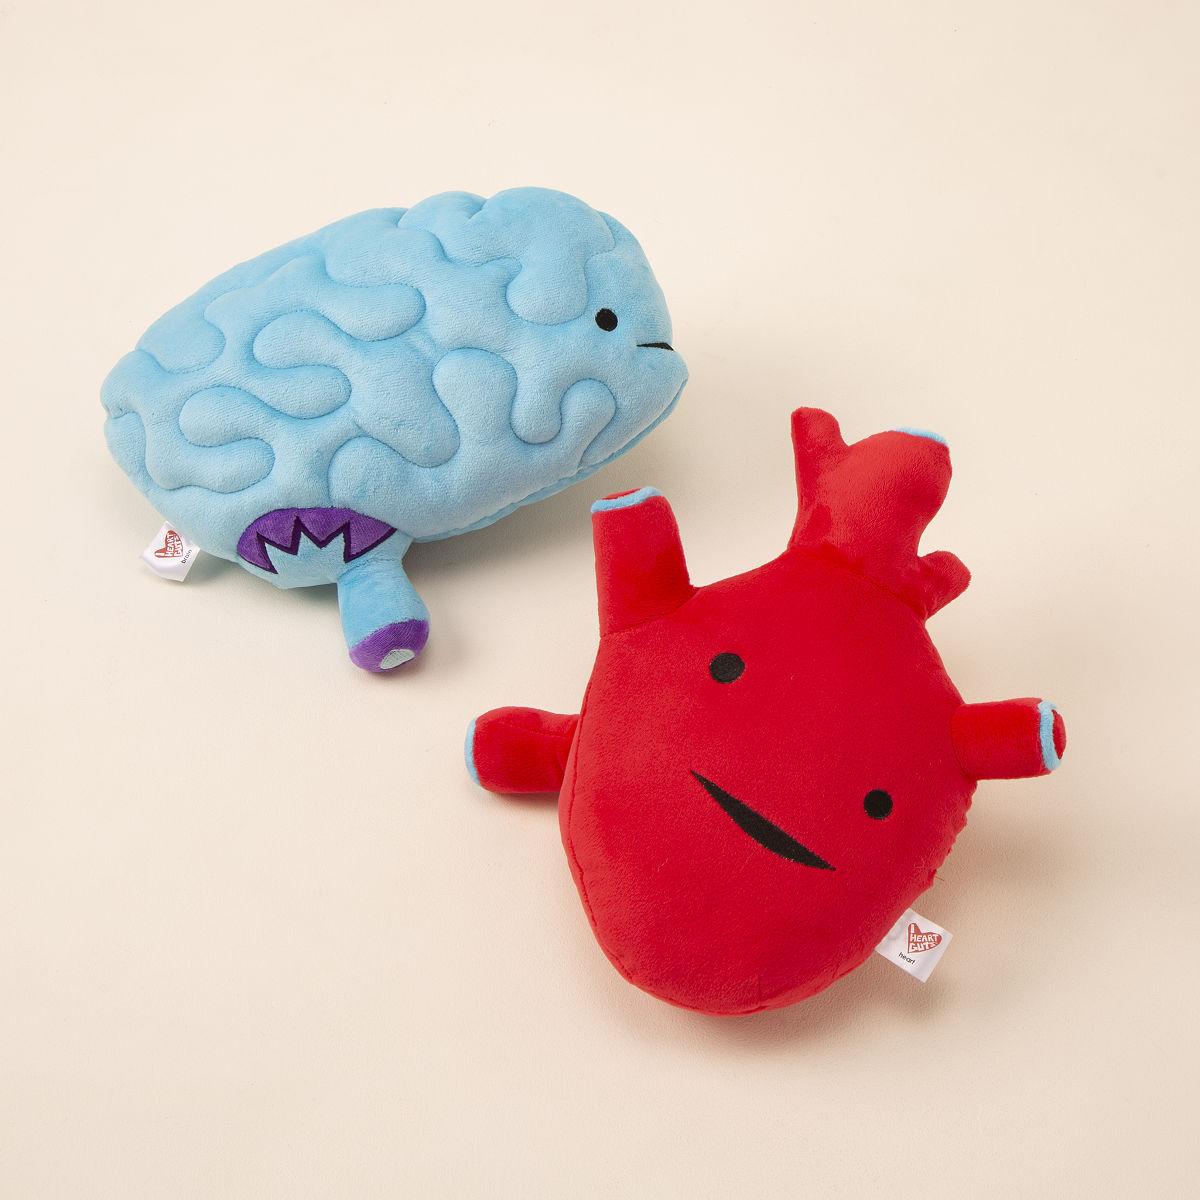 Plush Organs | Brain, Heart, Kidney, Uterus Toy | UncommonGoods